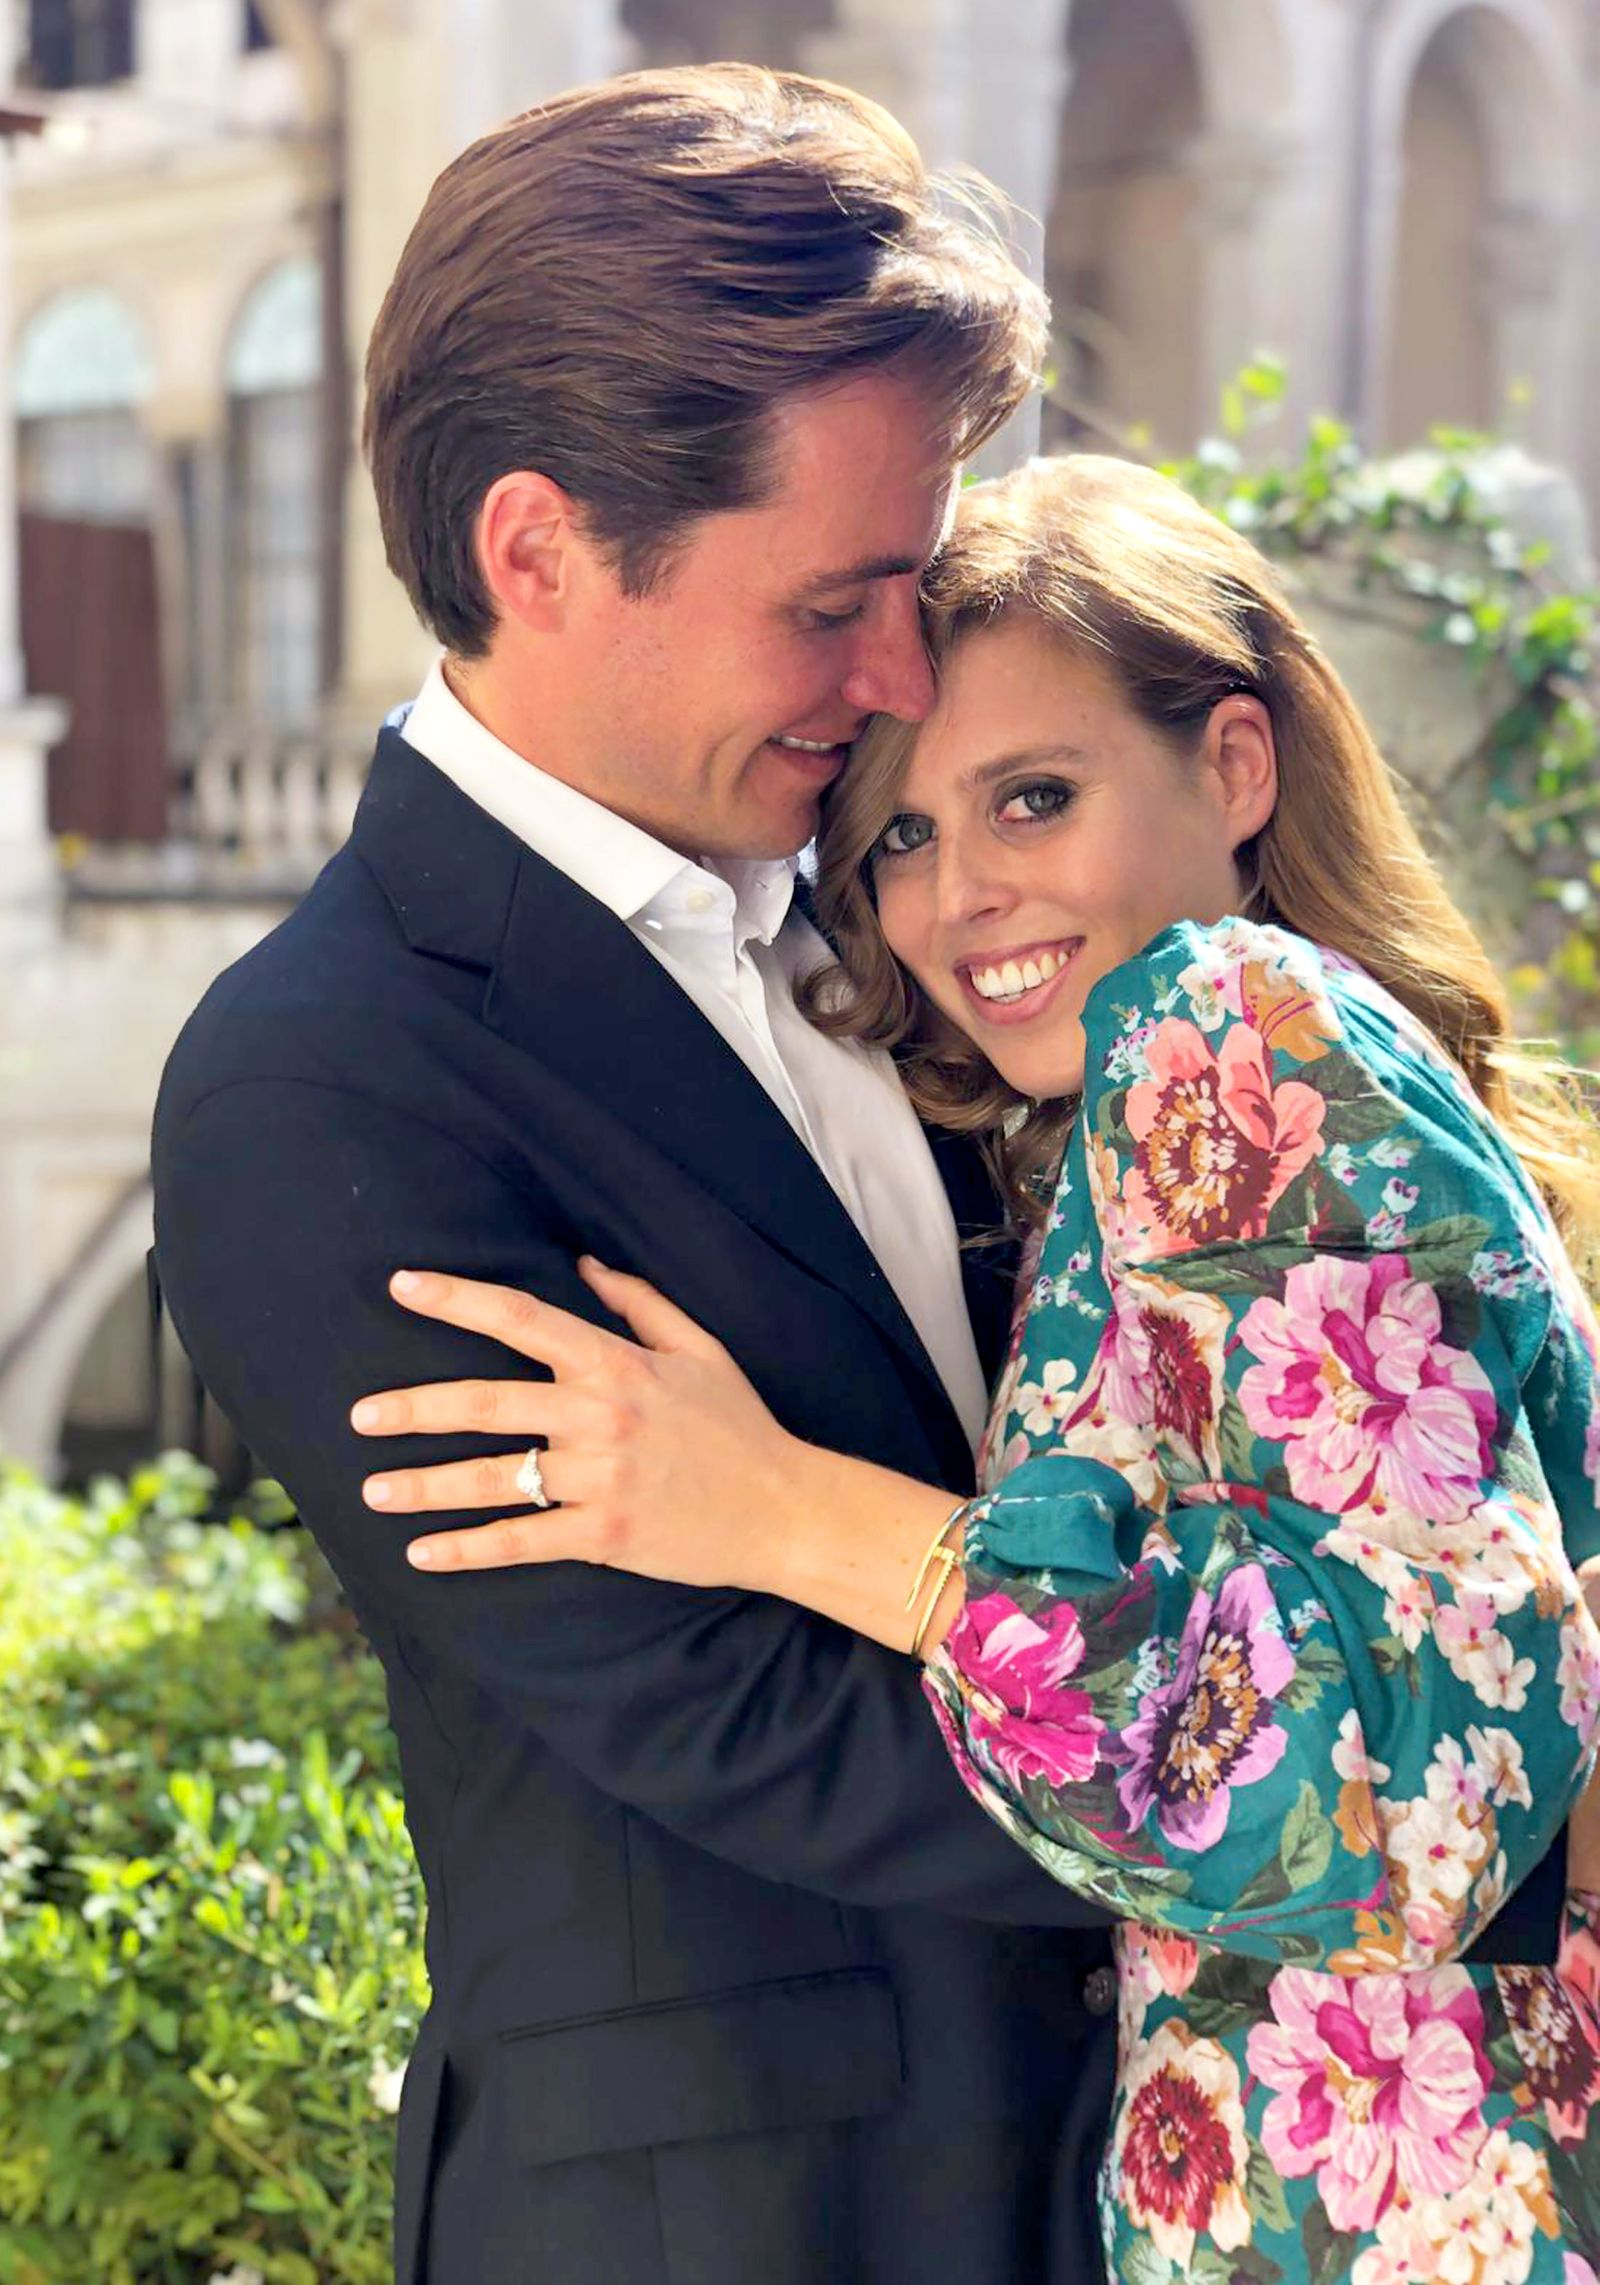 26/09/2019 Undated picture released by Buckingham Palace of Princess Beatrice and Mr Edoardo Mapelli Mozzi, whose engage